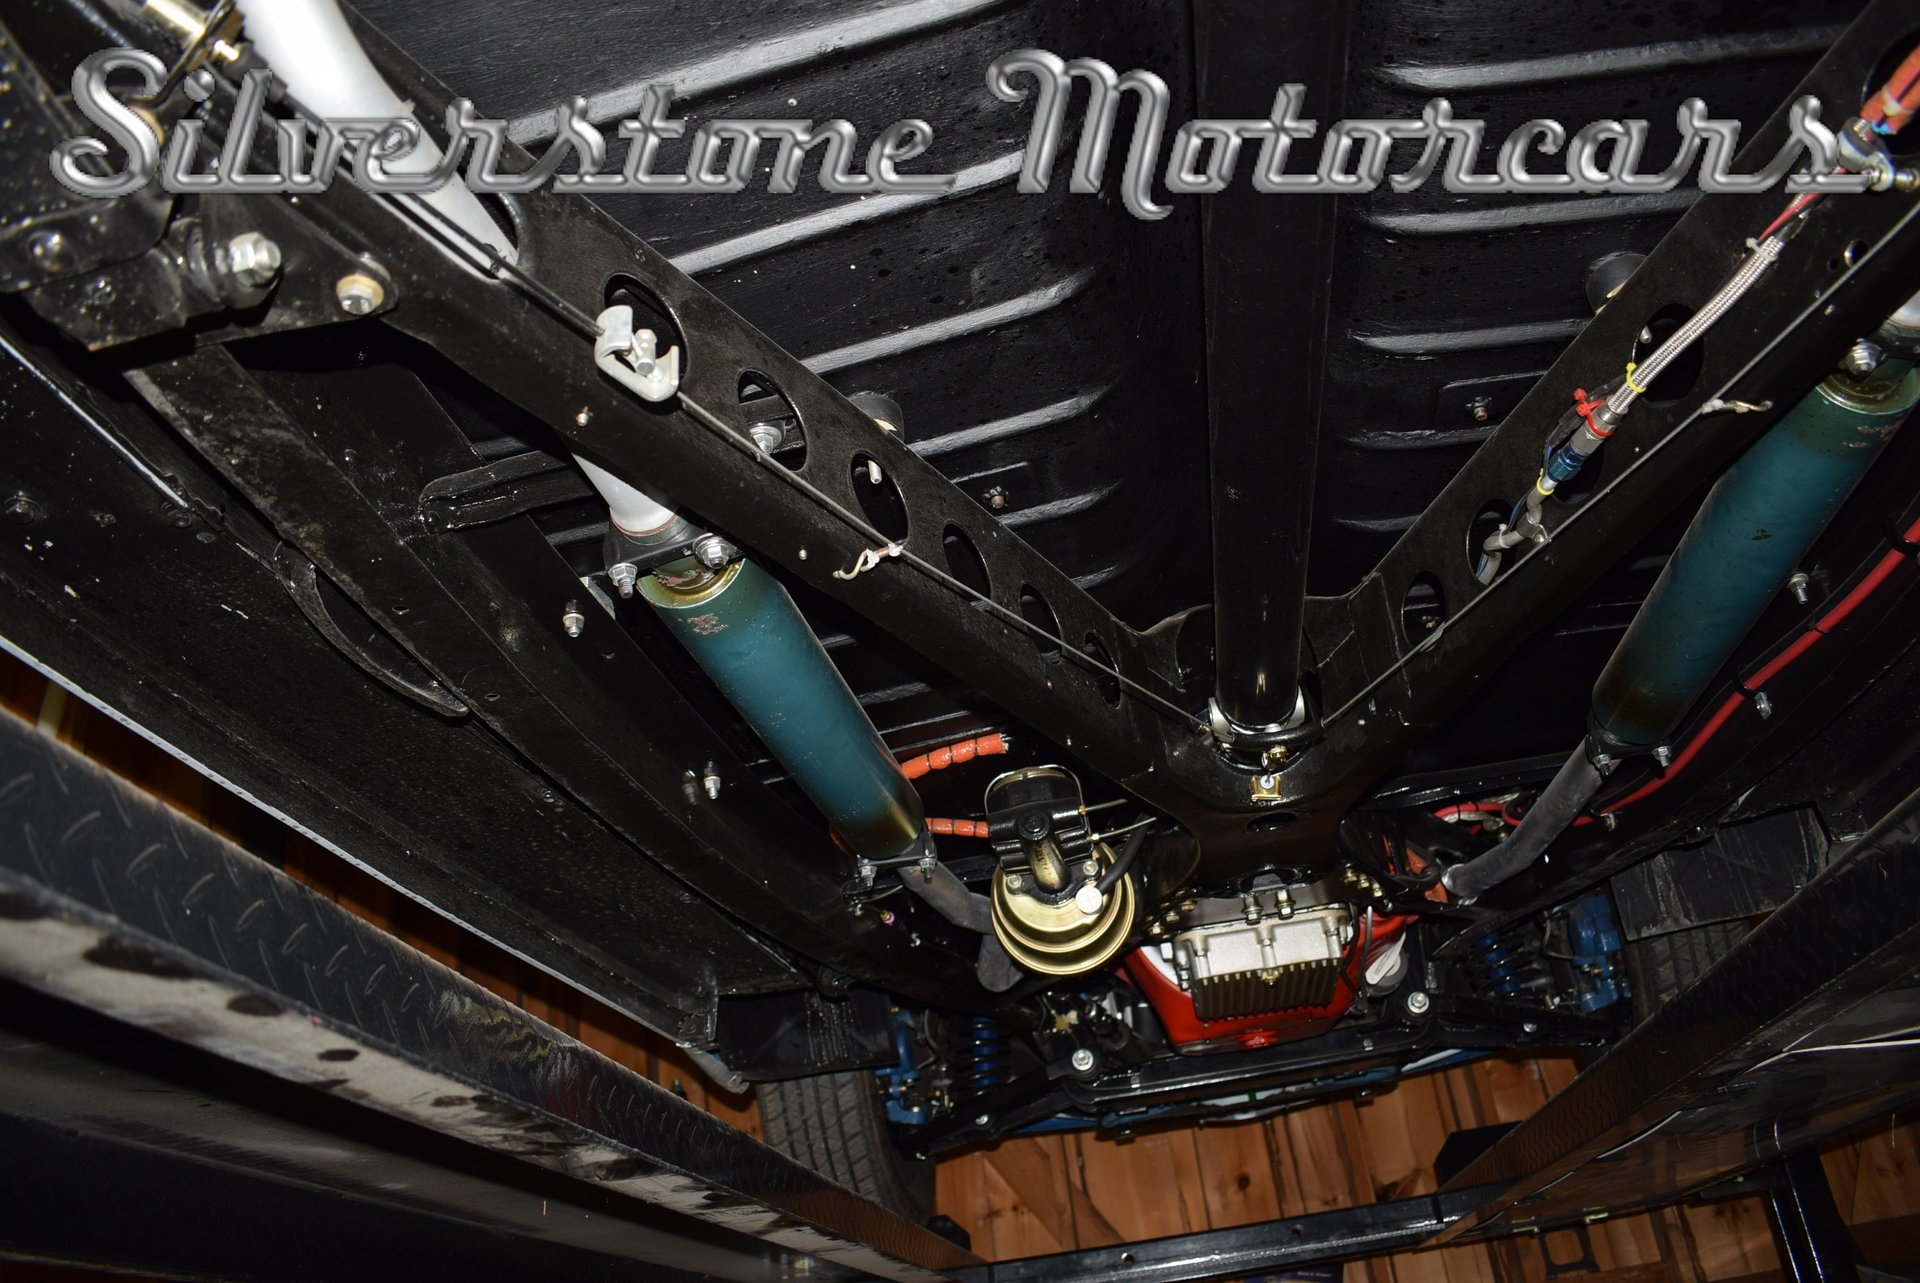 1941 Ford Sedan Silverstone Motorcars Vin Location